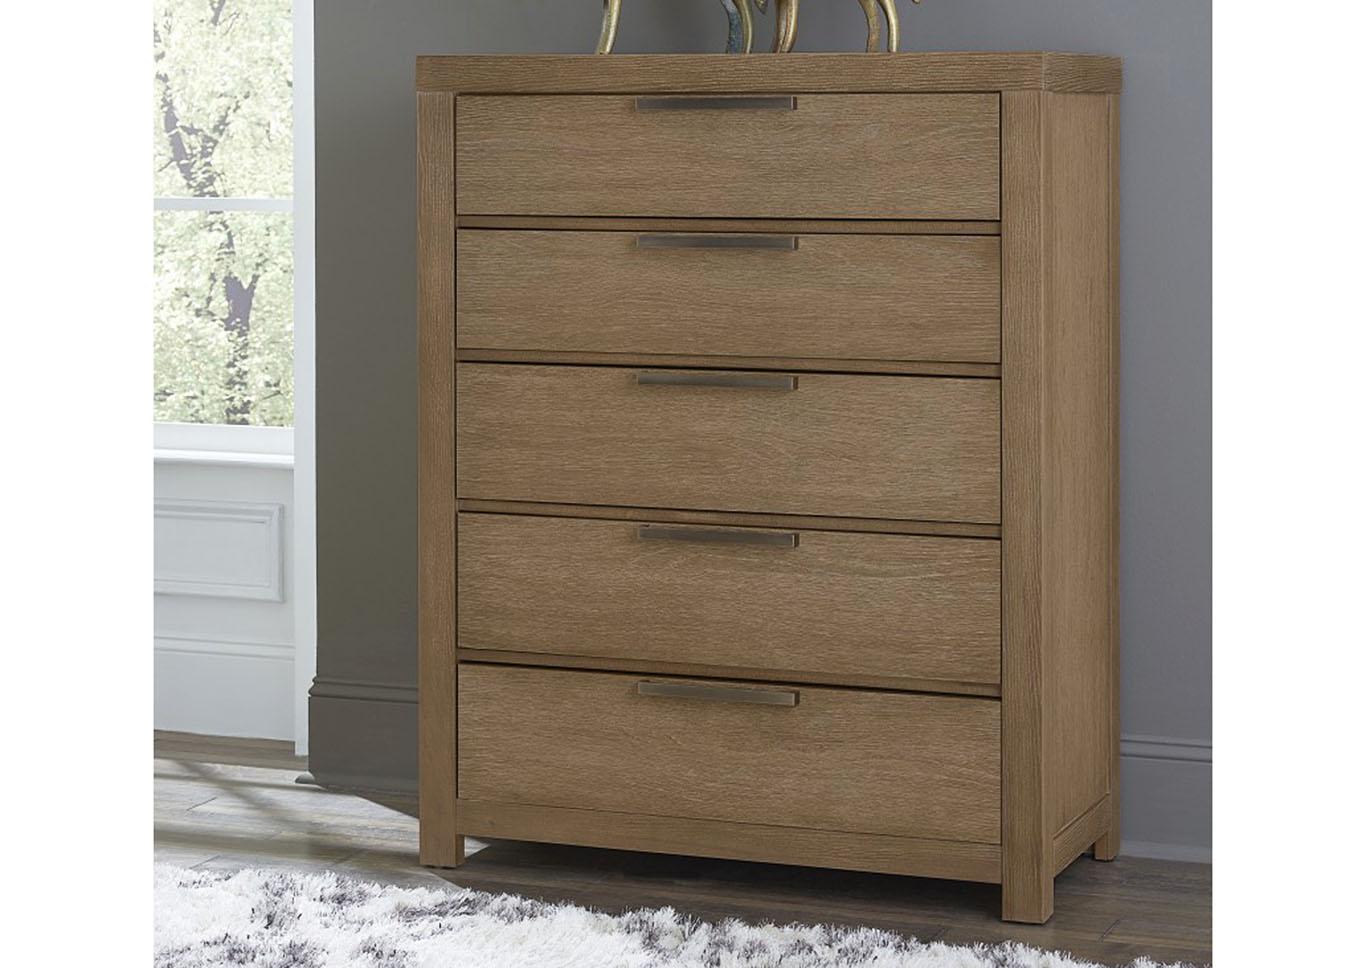 Stupendous Penlands Furniture American Modern Natural 5 Drawer Chest Download Free Architecture Designs Itiscsunscenecom